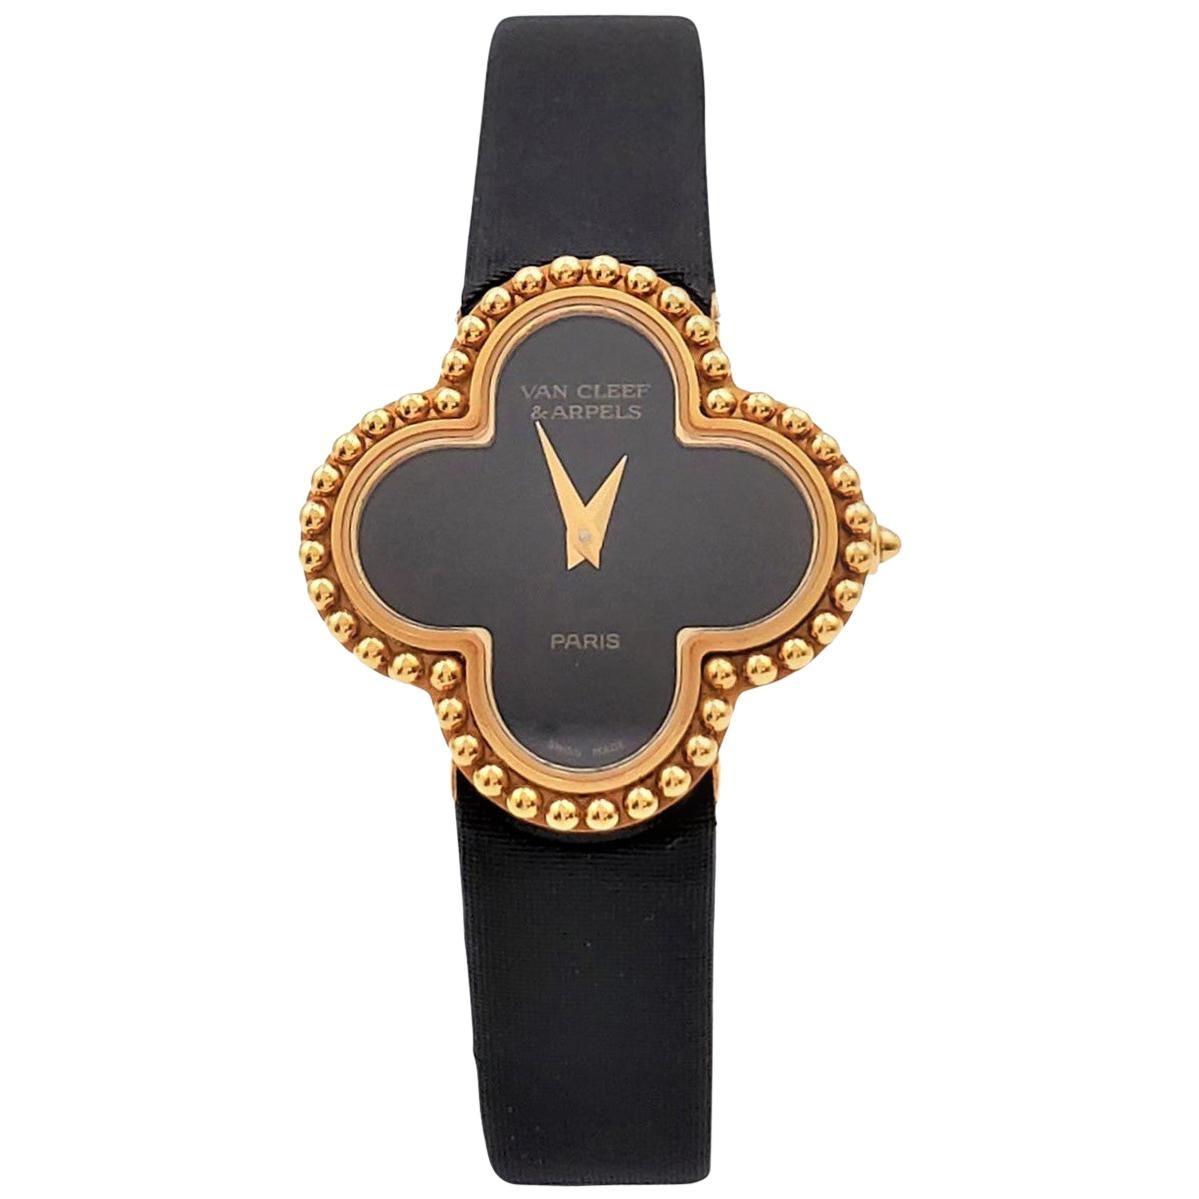 Van Cleef & Arpels 'Alhambra' Onyx Dial Watch, Small Model